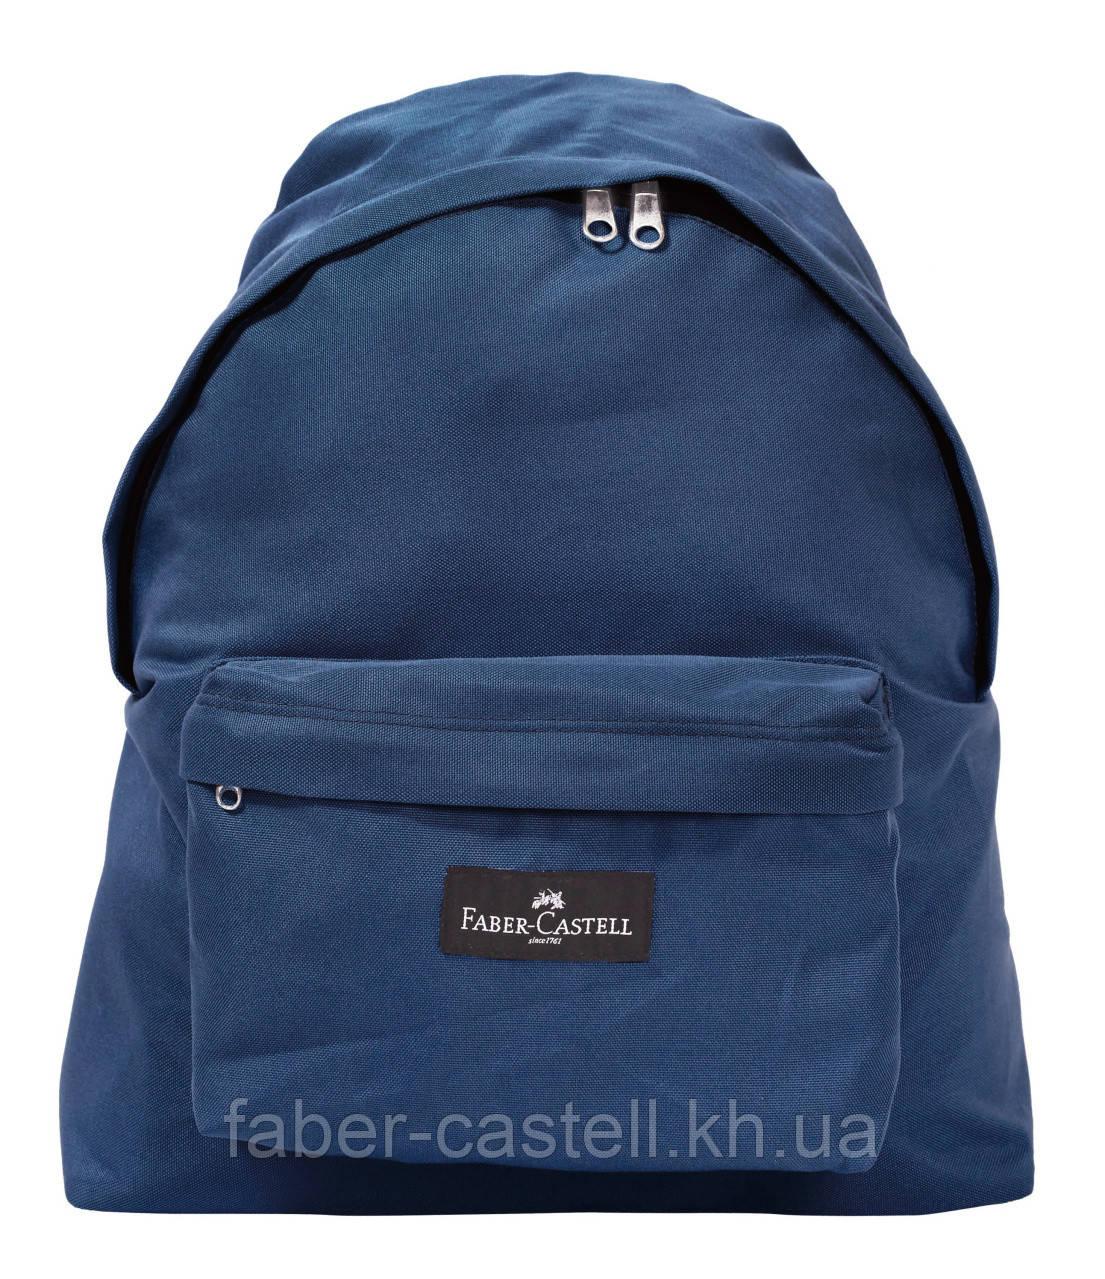 "Рюкзак  Faber-Castell  ""COLLEGE""  темно-синий,  40 х 33 х 11,5 см, 573252"